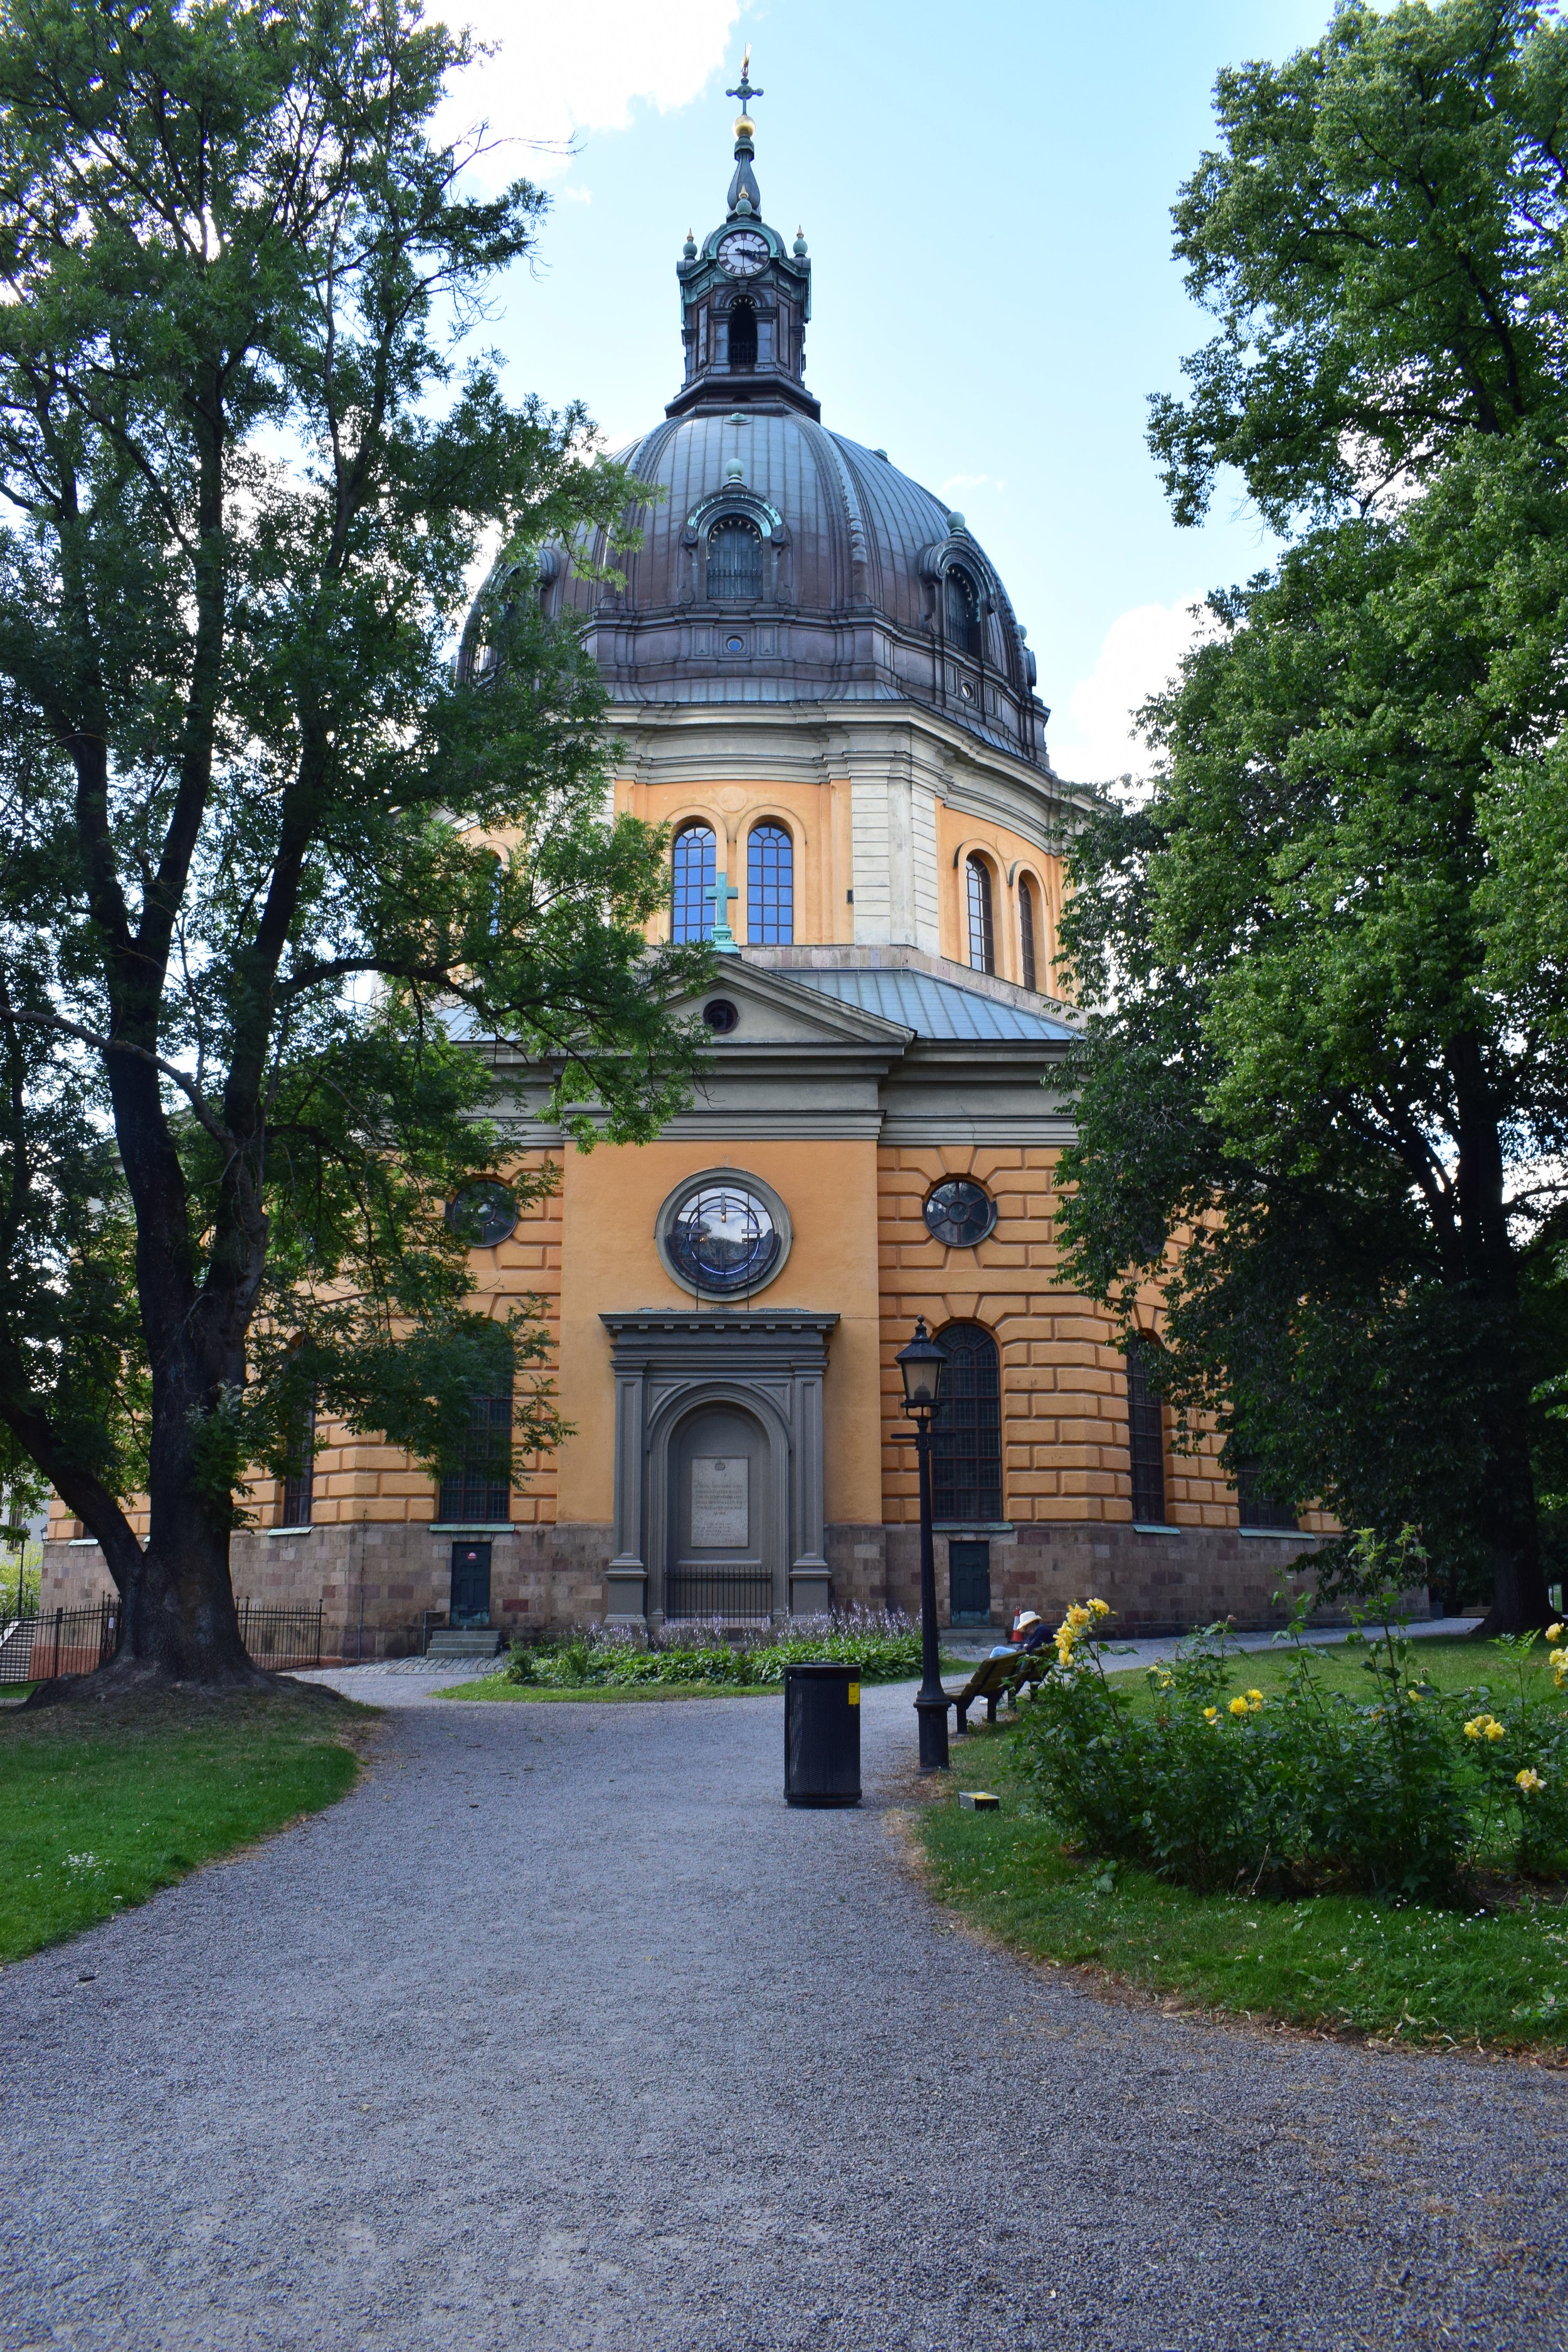 Göran Josuae Adelcrantz, Hedvig Eleonora kyrka (Church of Hedvig Eleonora), 1725-1737, Stockholm